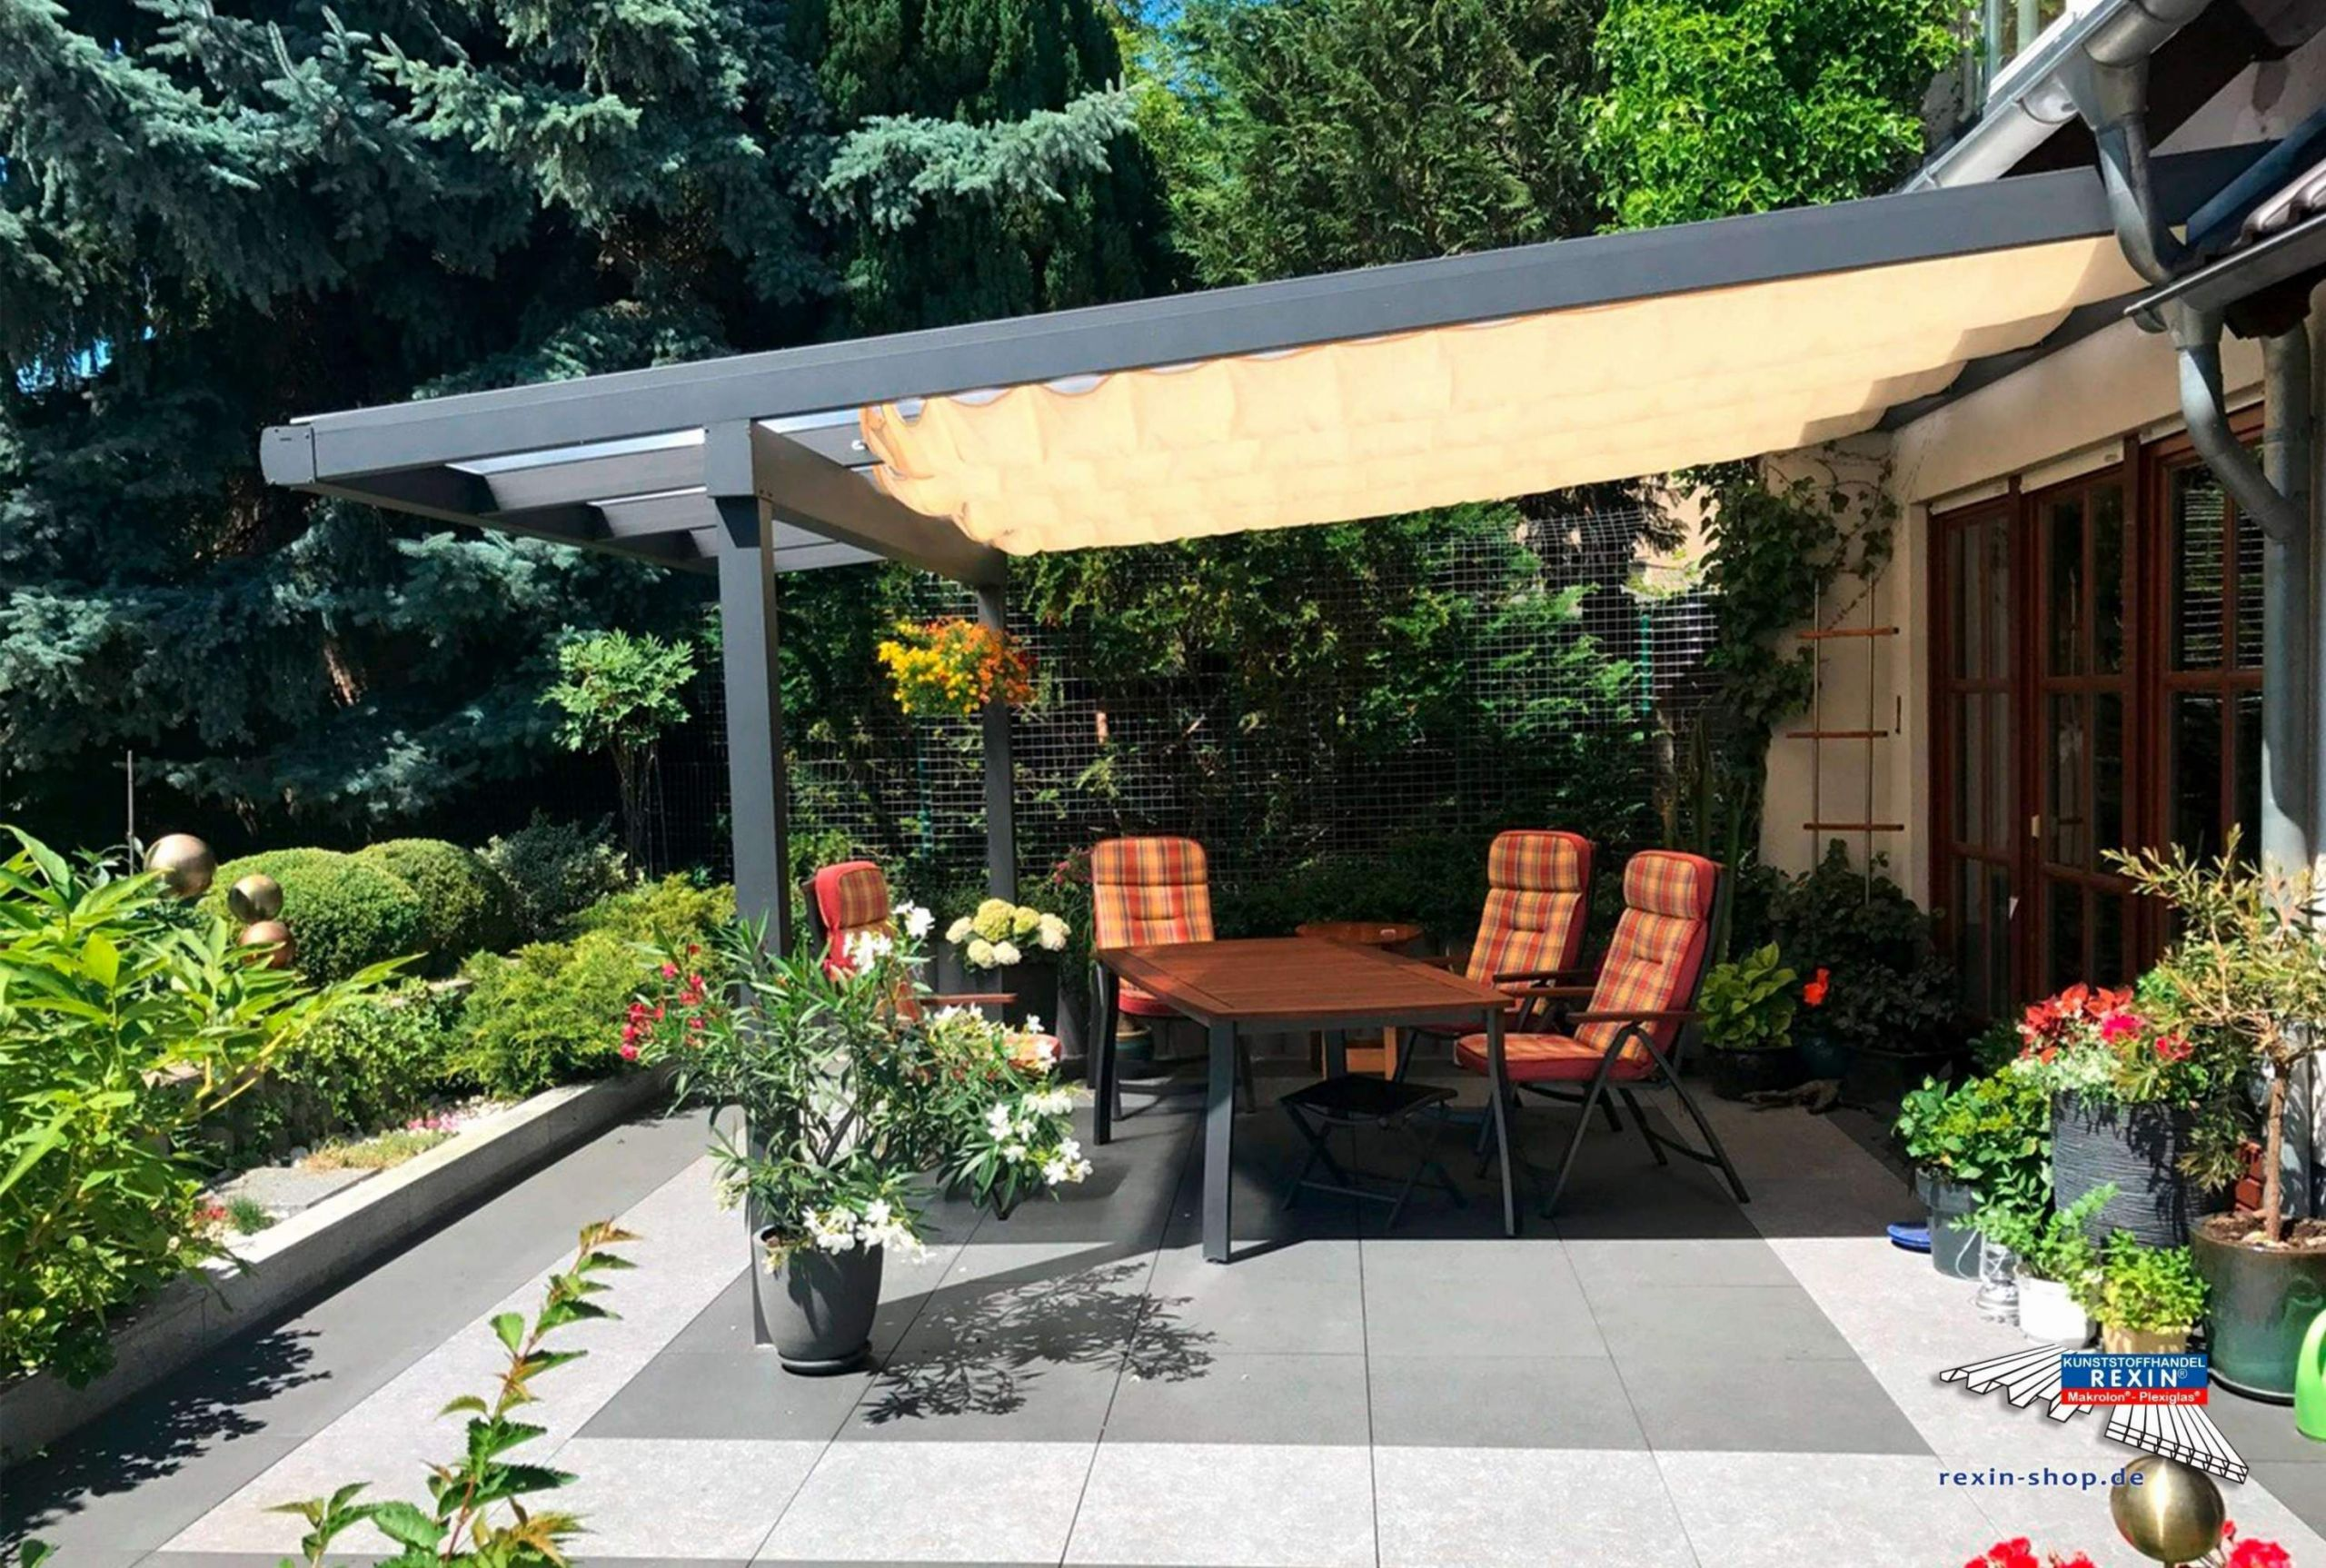 sonnenschutz garten elegant 40 frisch pergola markise sonnenschutz garten terrasse sonnenschutz garten terrasse